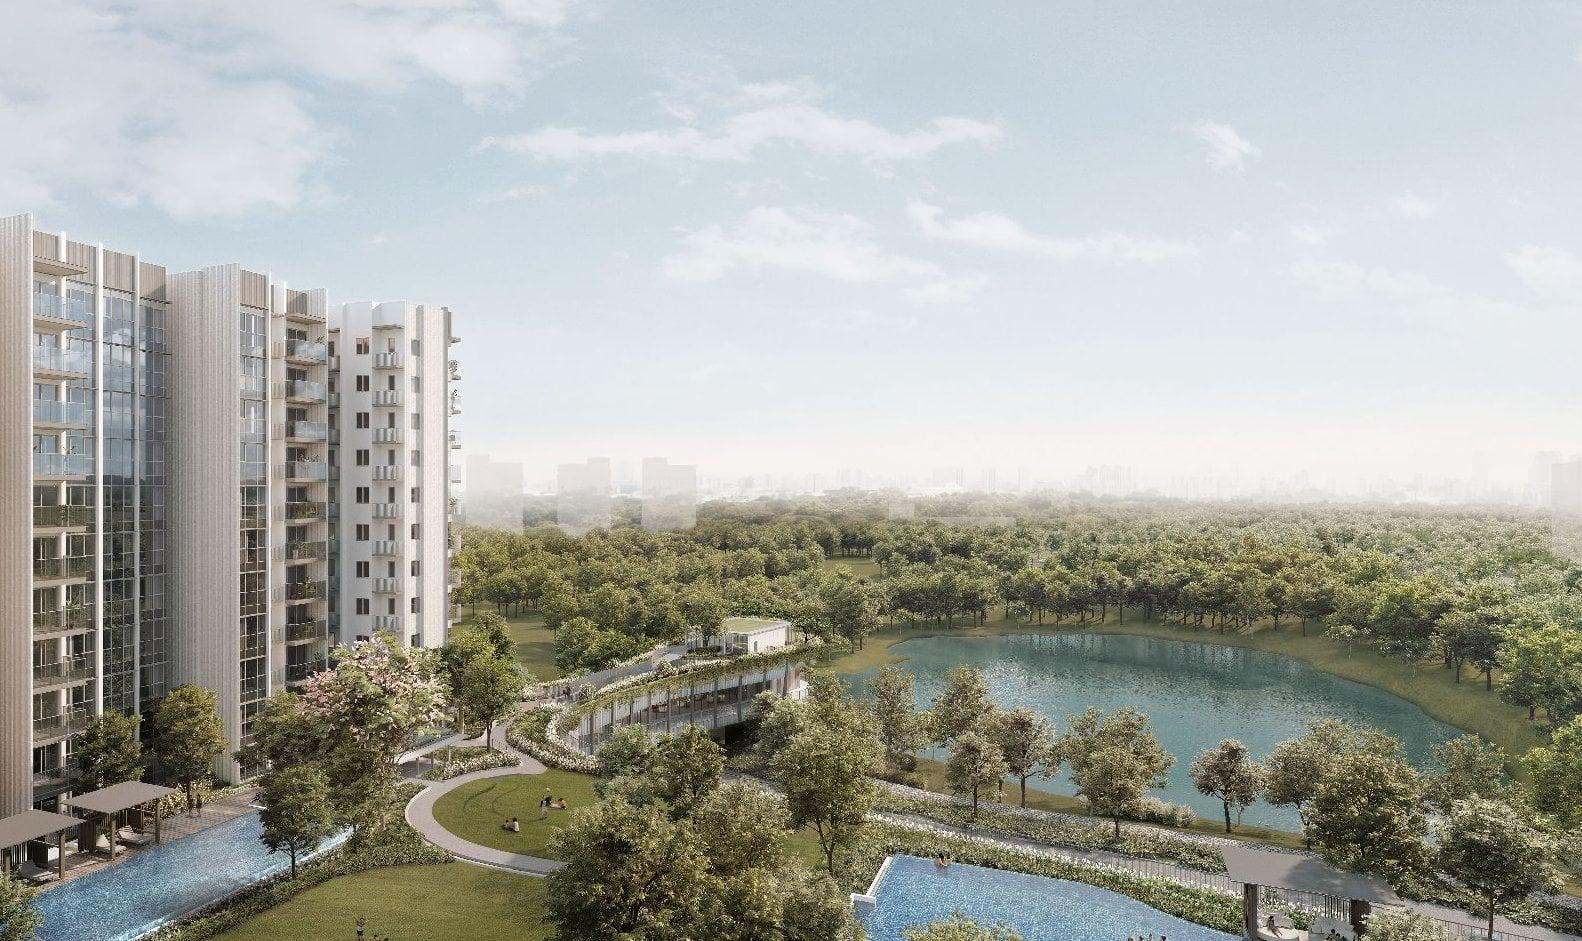 The-Woodleigh-Residences-unblocked-views-of-Bidadari-lake